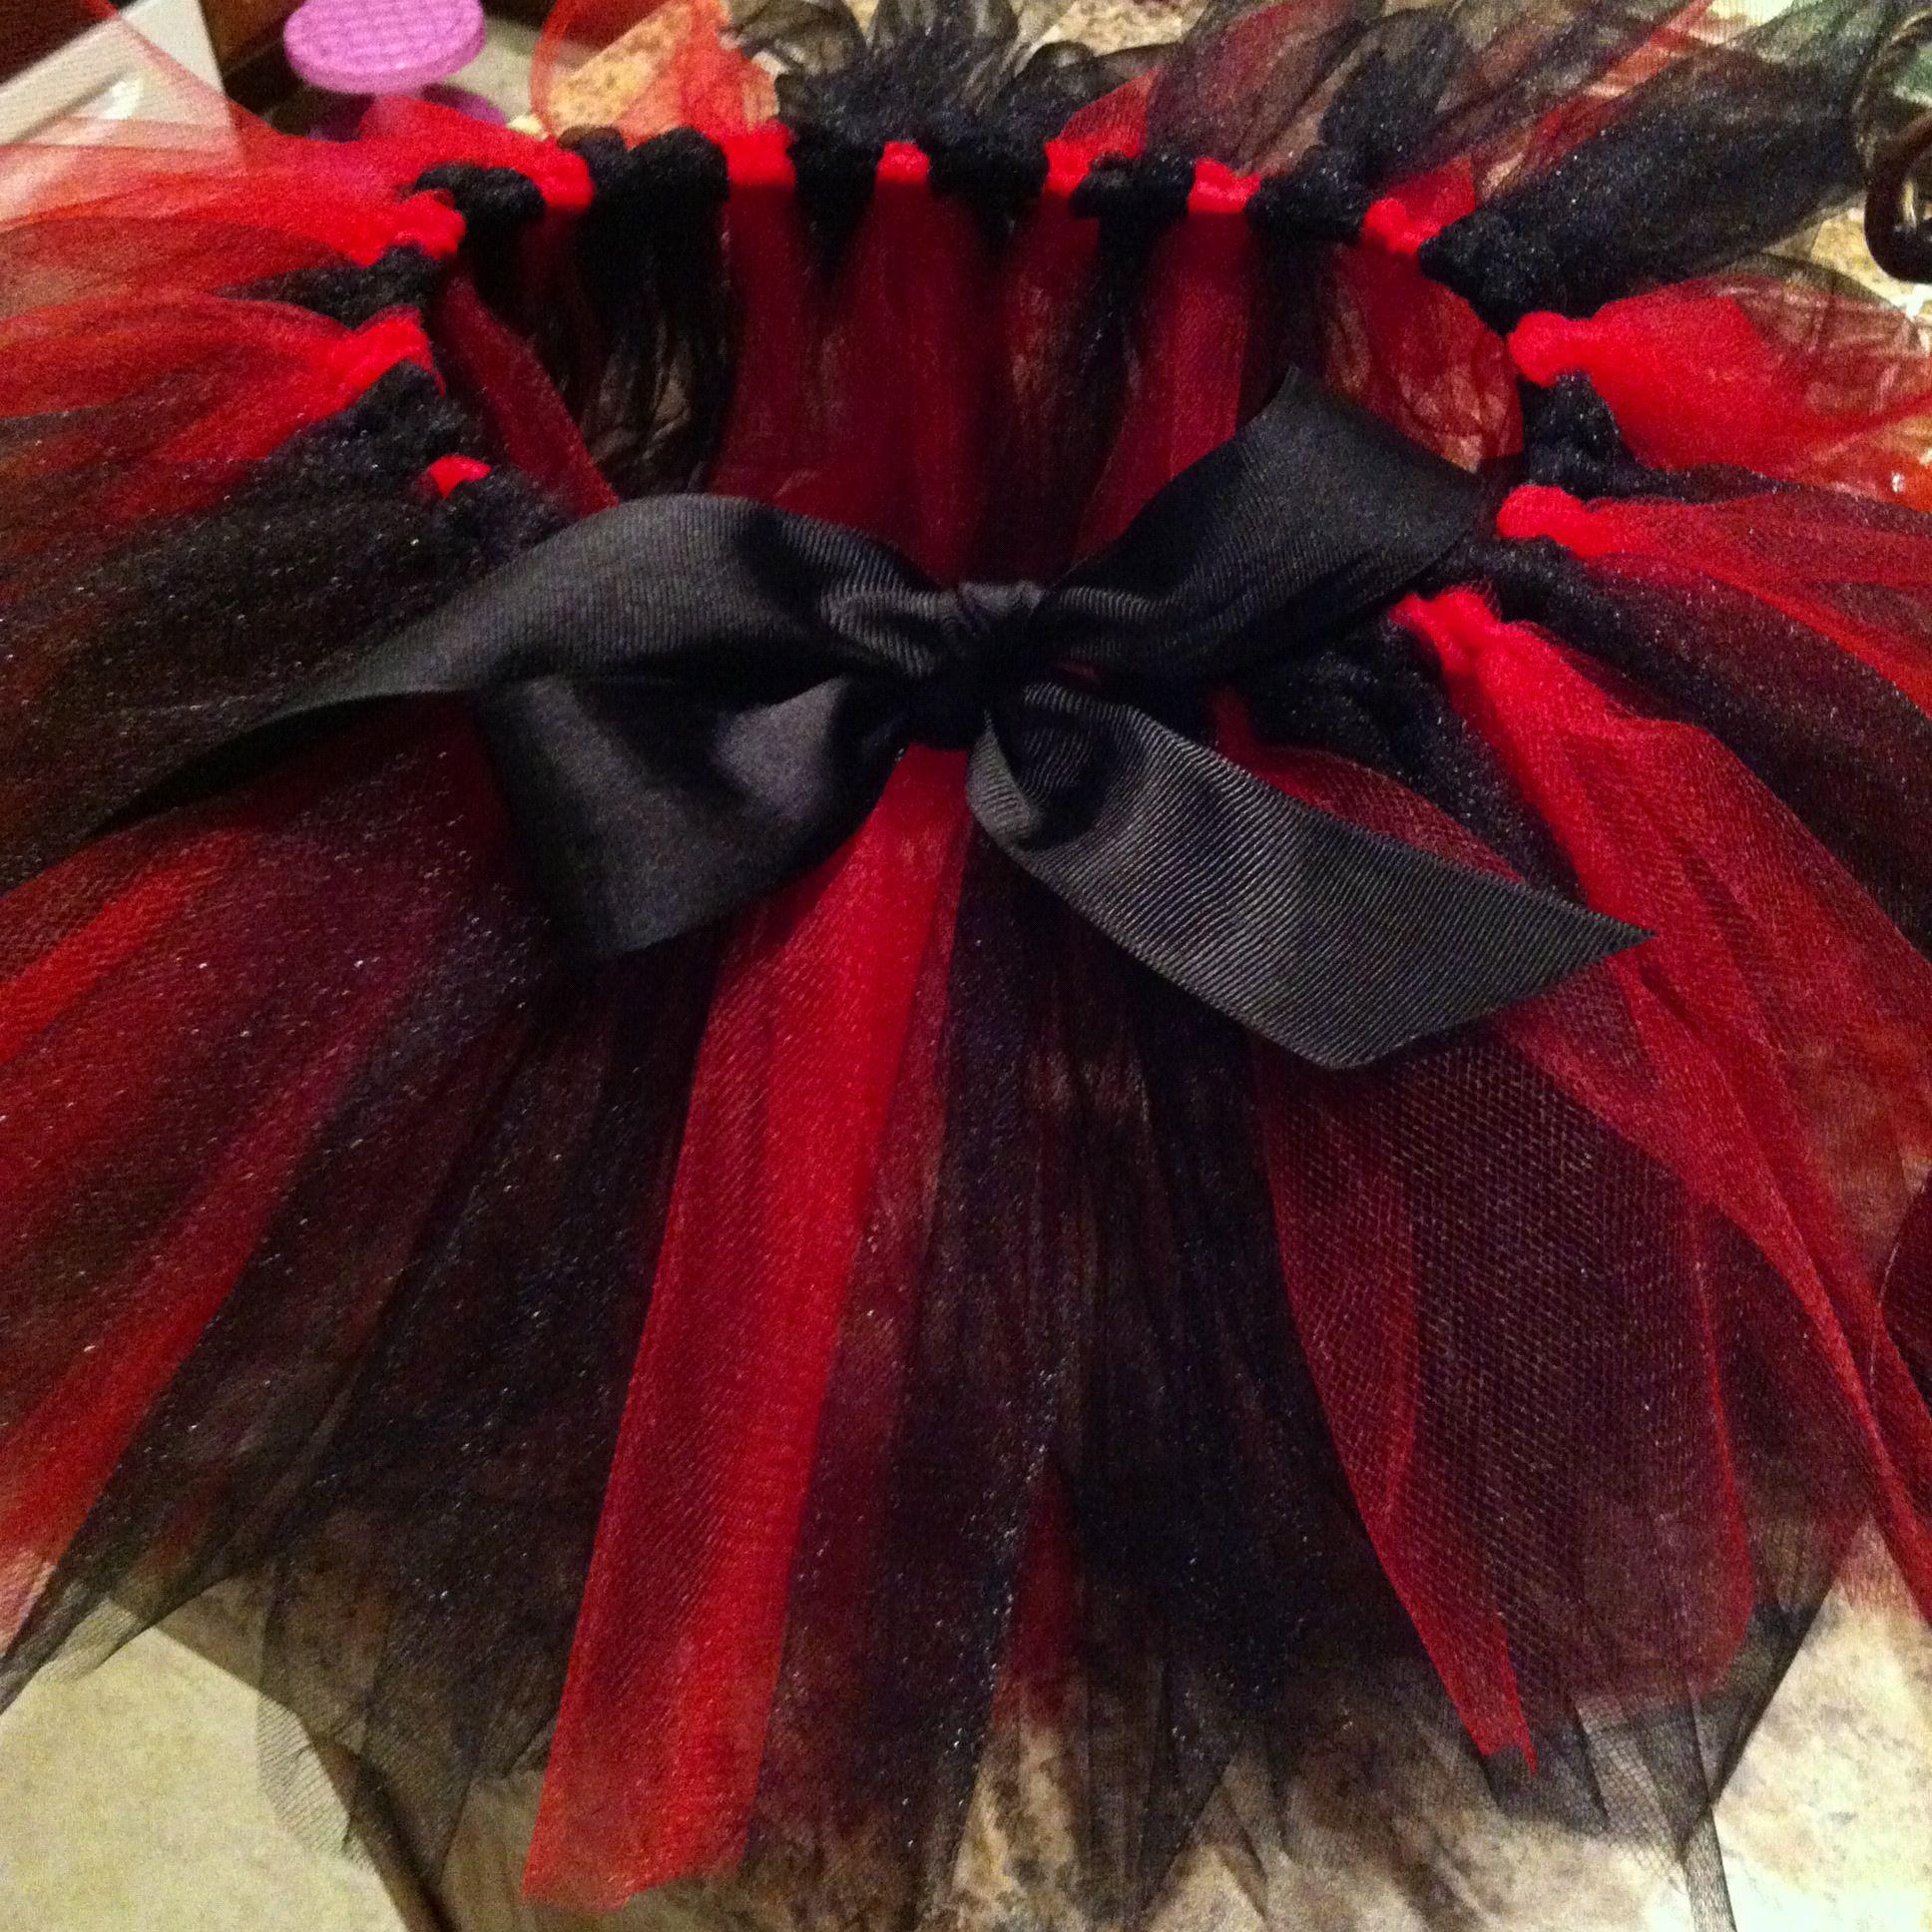 black and red tutu kost m pinterest kost m fasching 2019 und fasching. Black Bedroom Furniture Sets. Home Design Ideas